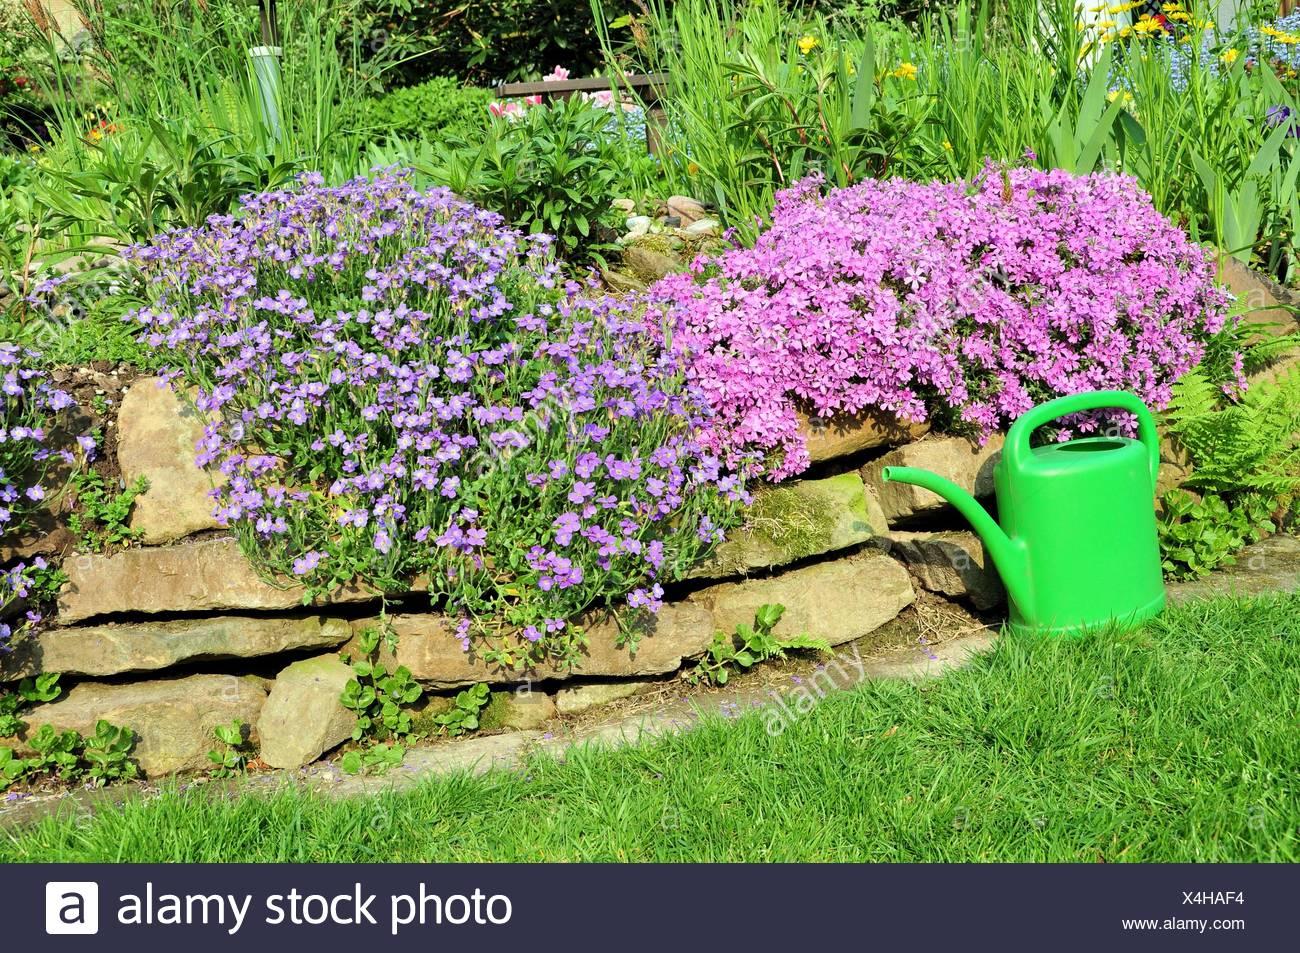 Gießkanne Garten Stockfoto Bild 278205960 Alamy